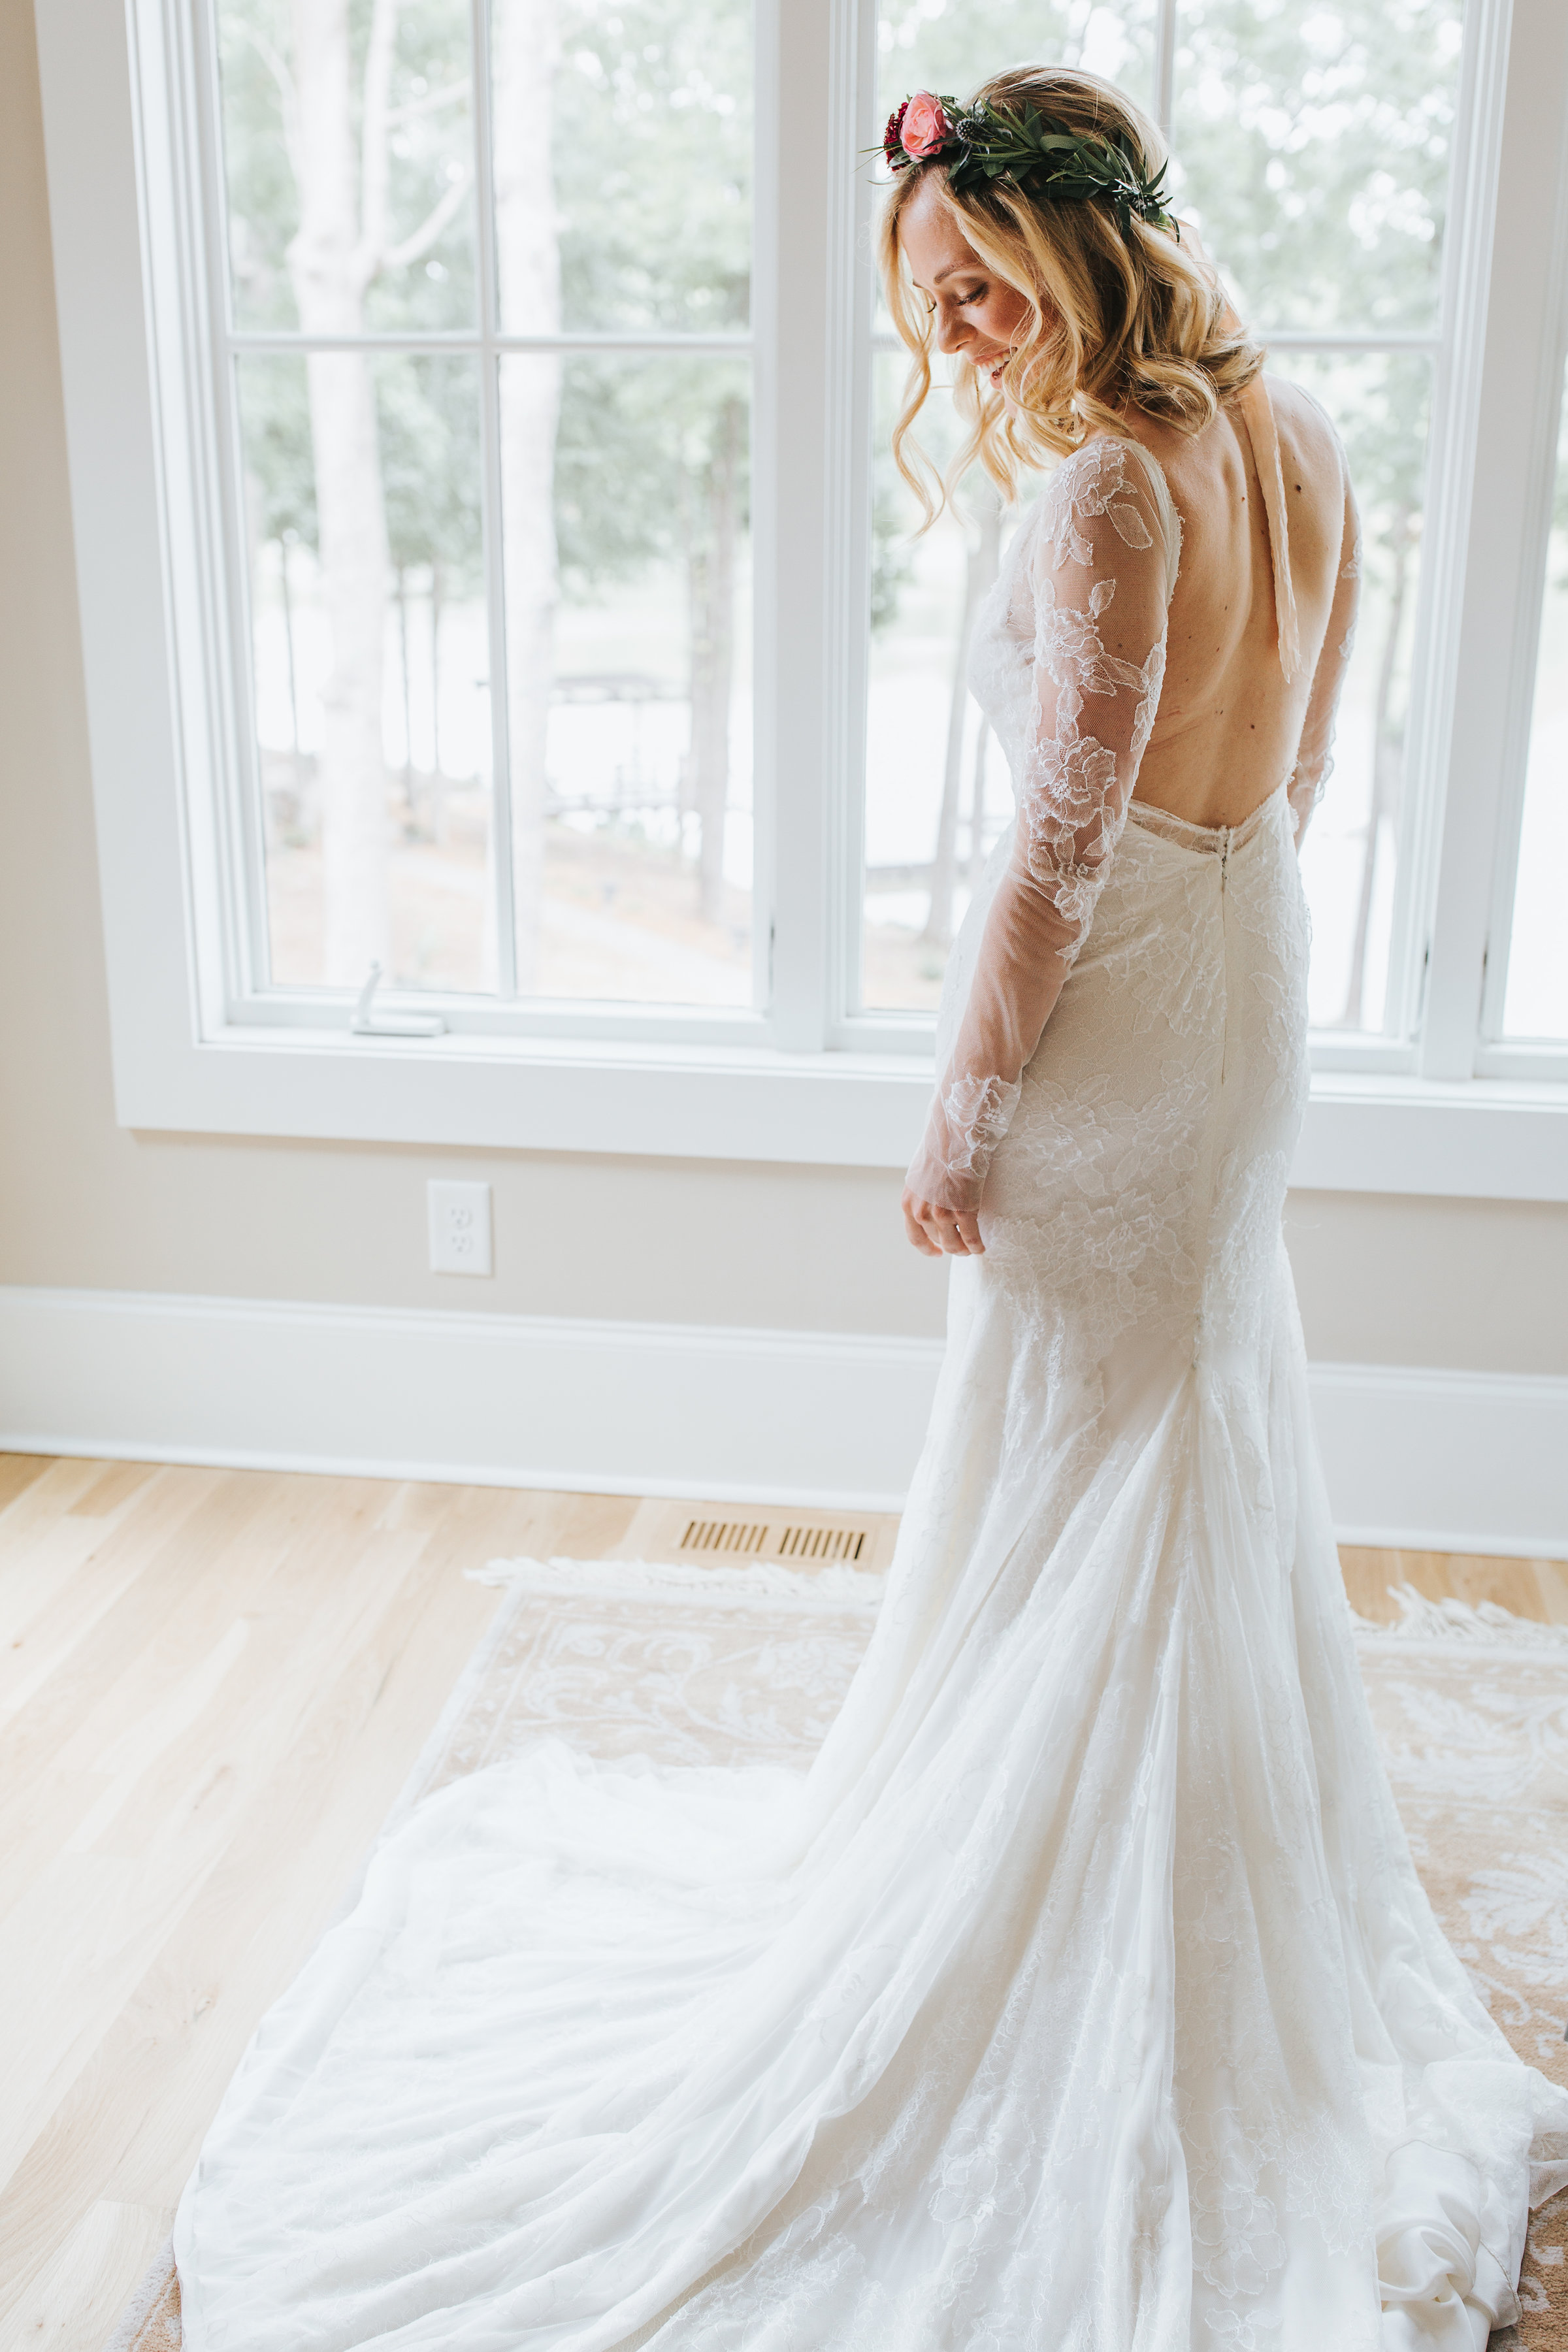 SethandKate_Wedding_MSP_HighRes(148of1195).jpg